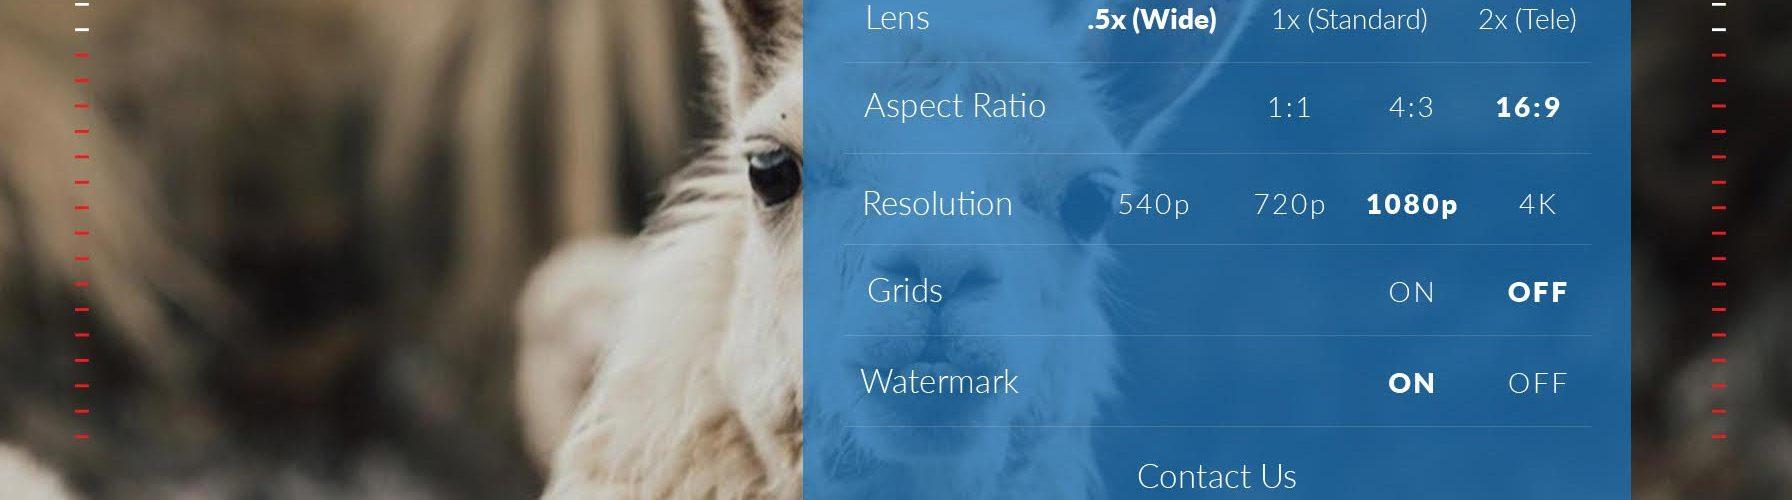 Hooke Audio releases Hooke App Version 2 for 3D Audio & Video